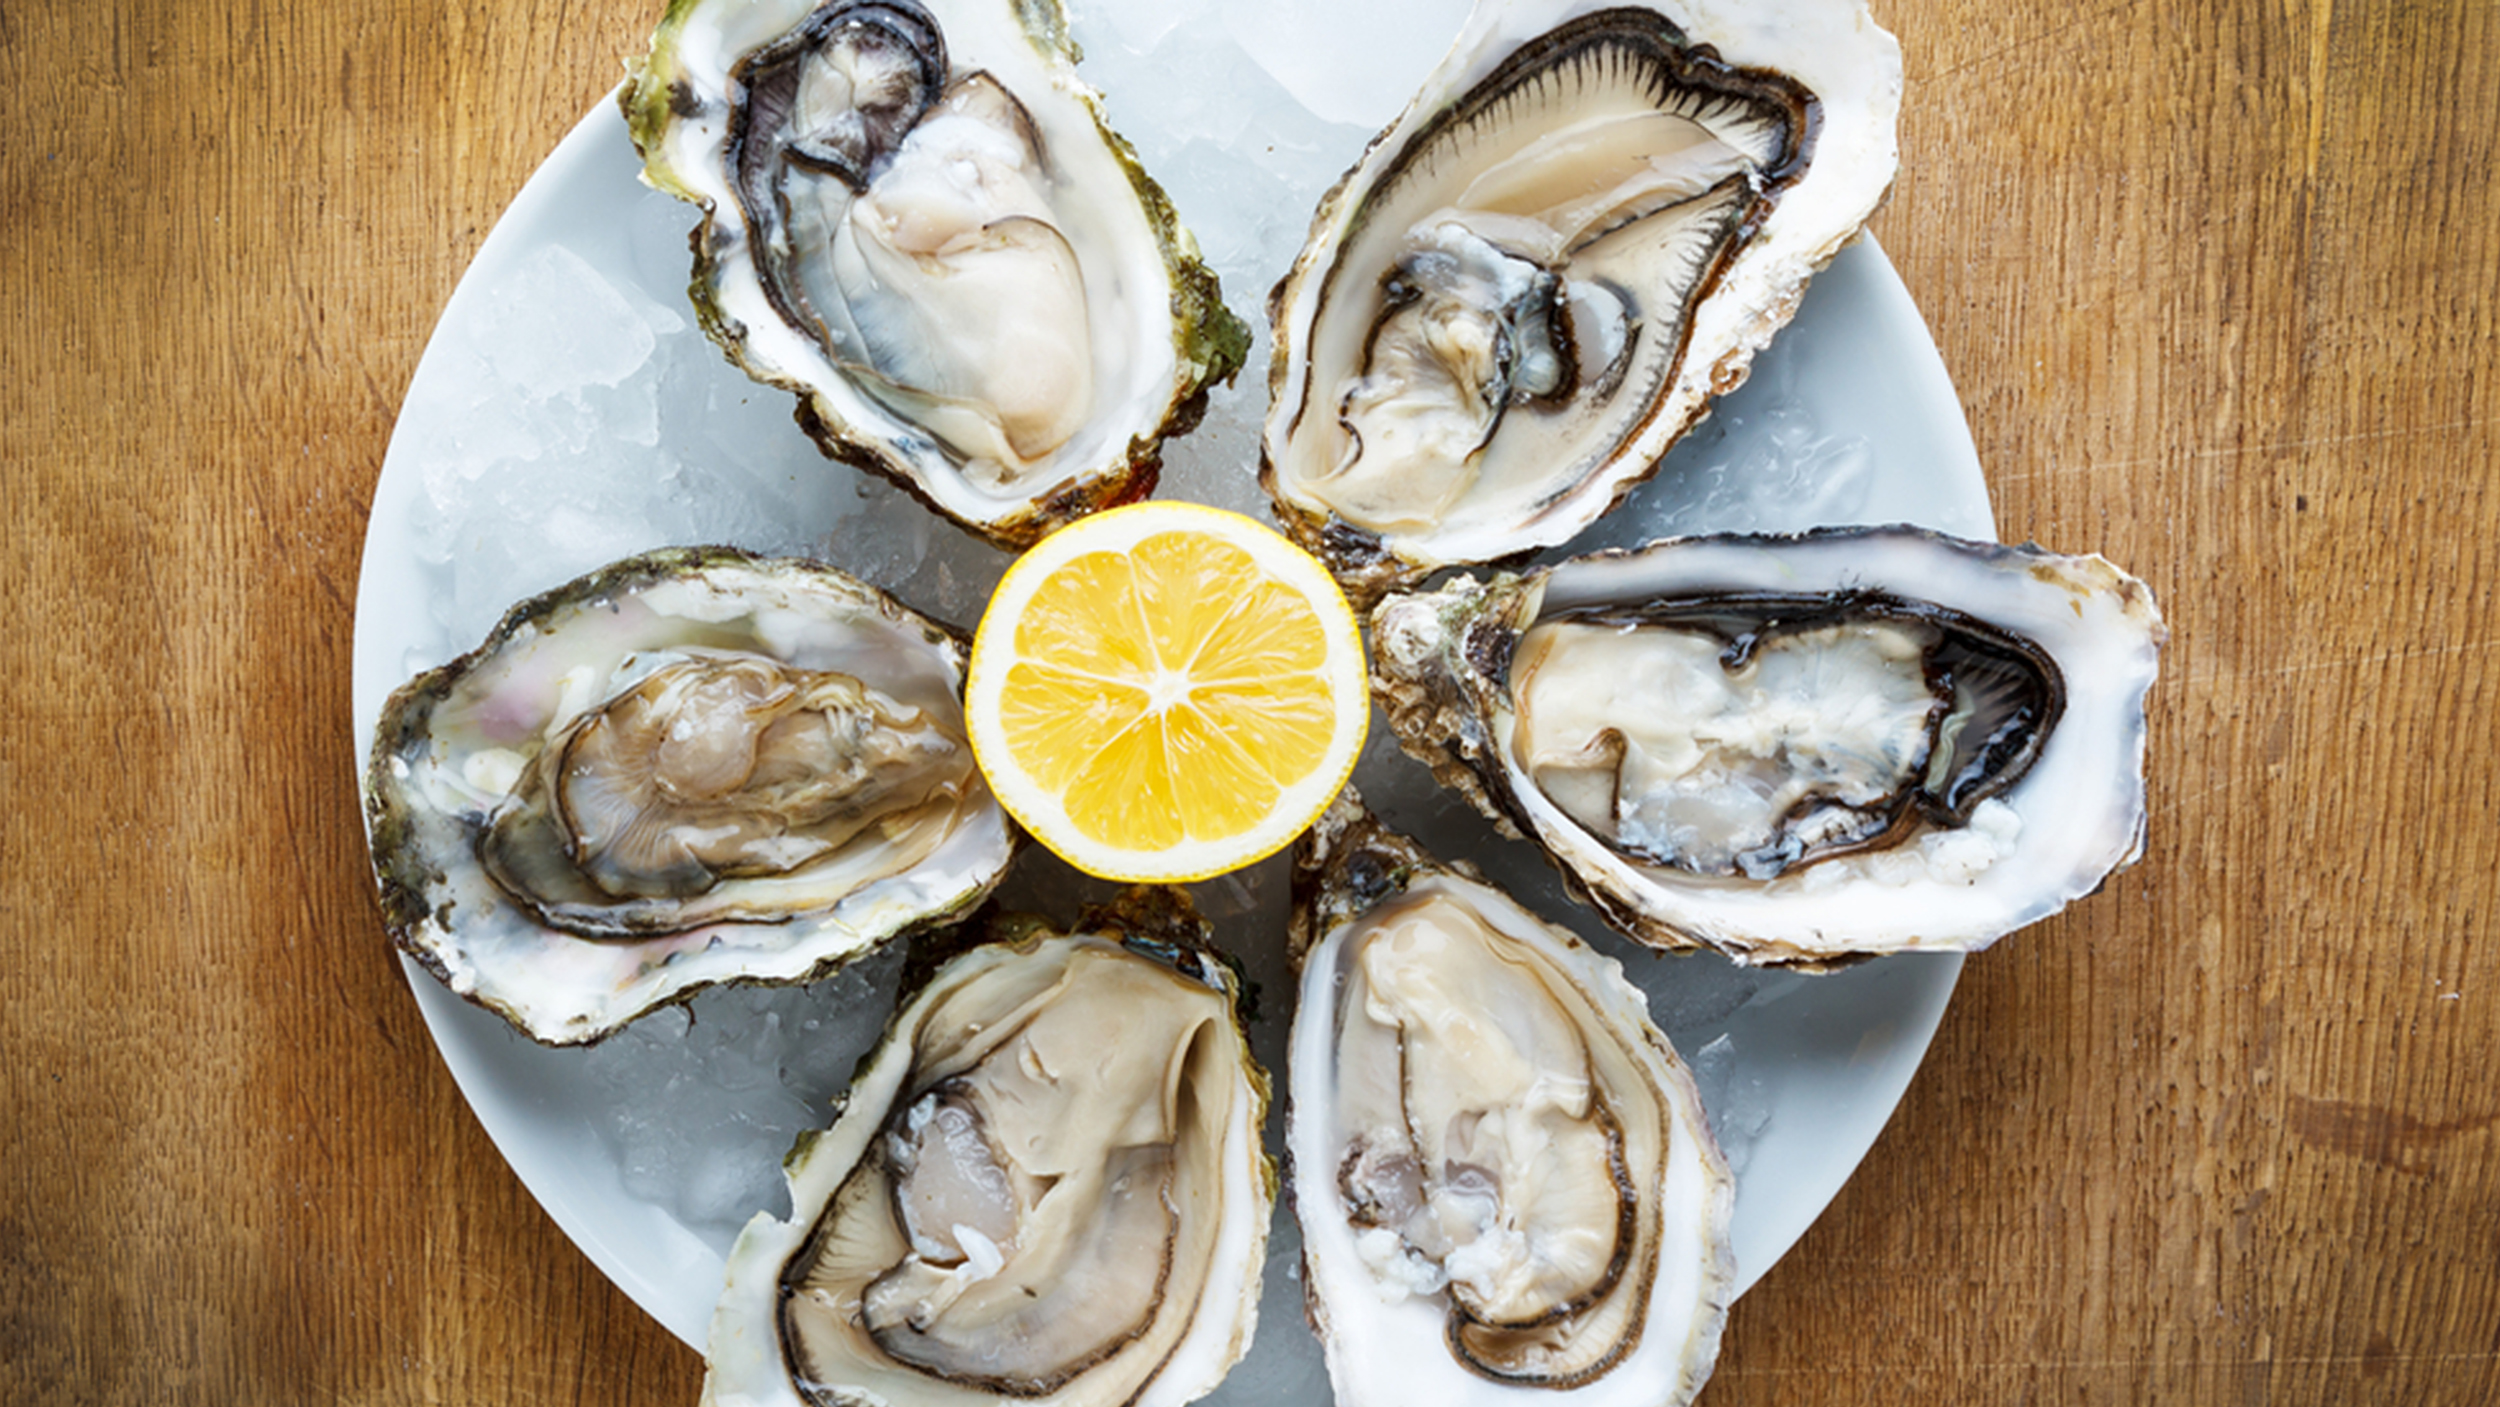 oysters-lemon-stock-today-tease-150806_477f67ef1a7127c43303ec79e6d3541f.jpg